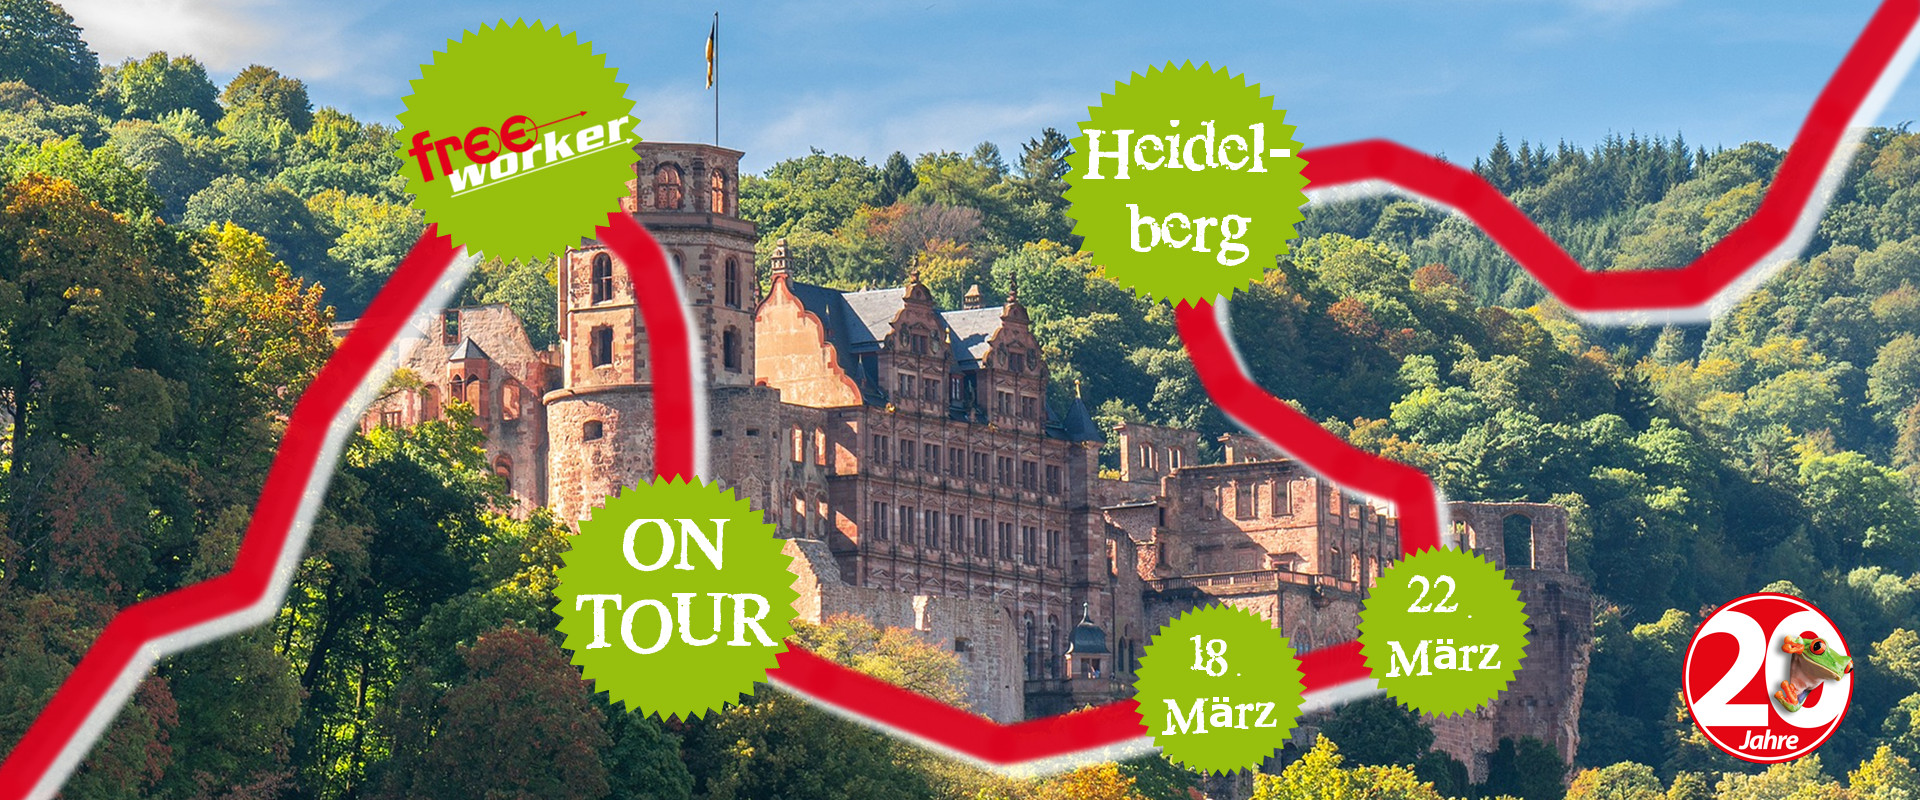 Permalink zu:Freeworker Is Comin' to Town – Heidelberg